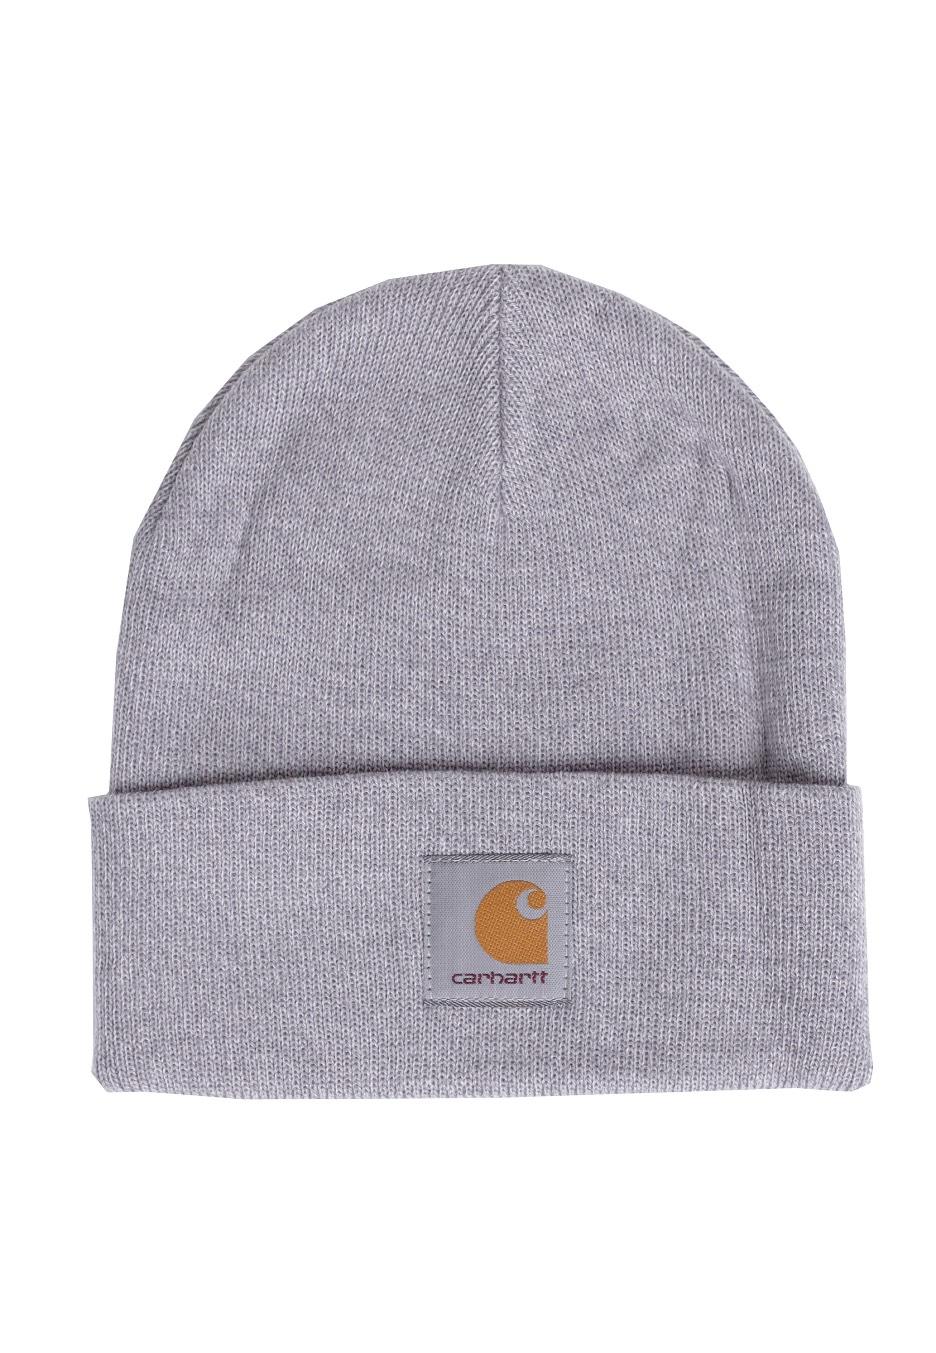 Carhartt WIP - Short Watch Grey Heather - Beanie - Streetwear Shop -  Impericon.com UK 90858410893